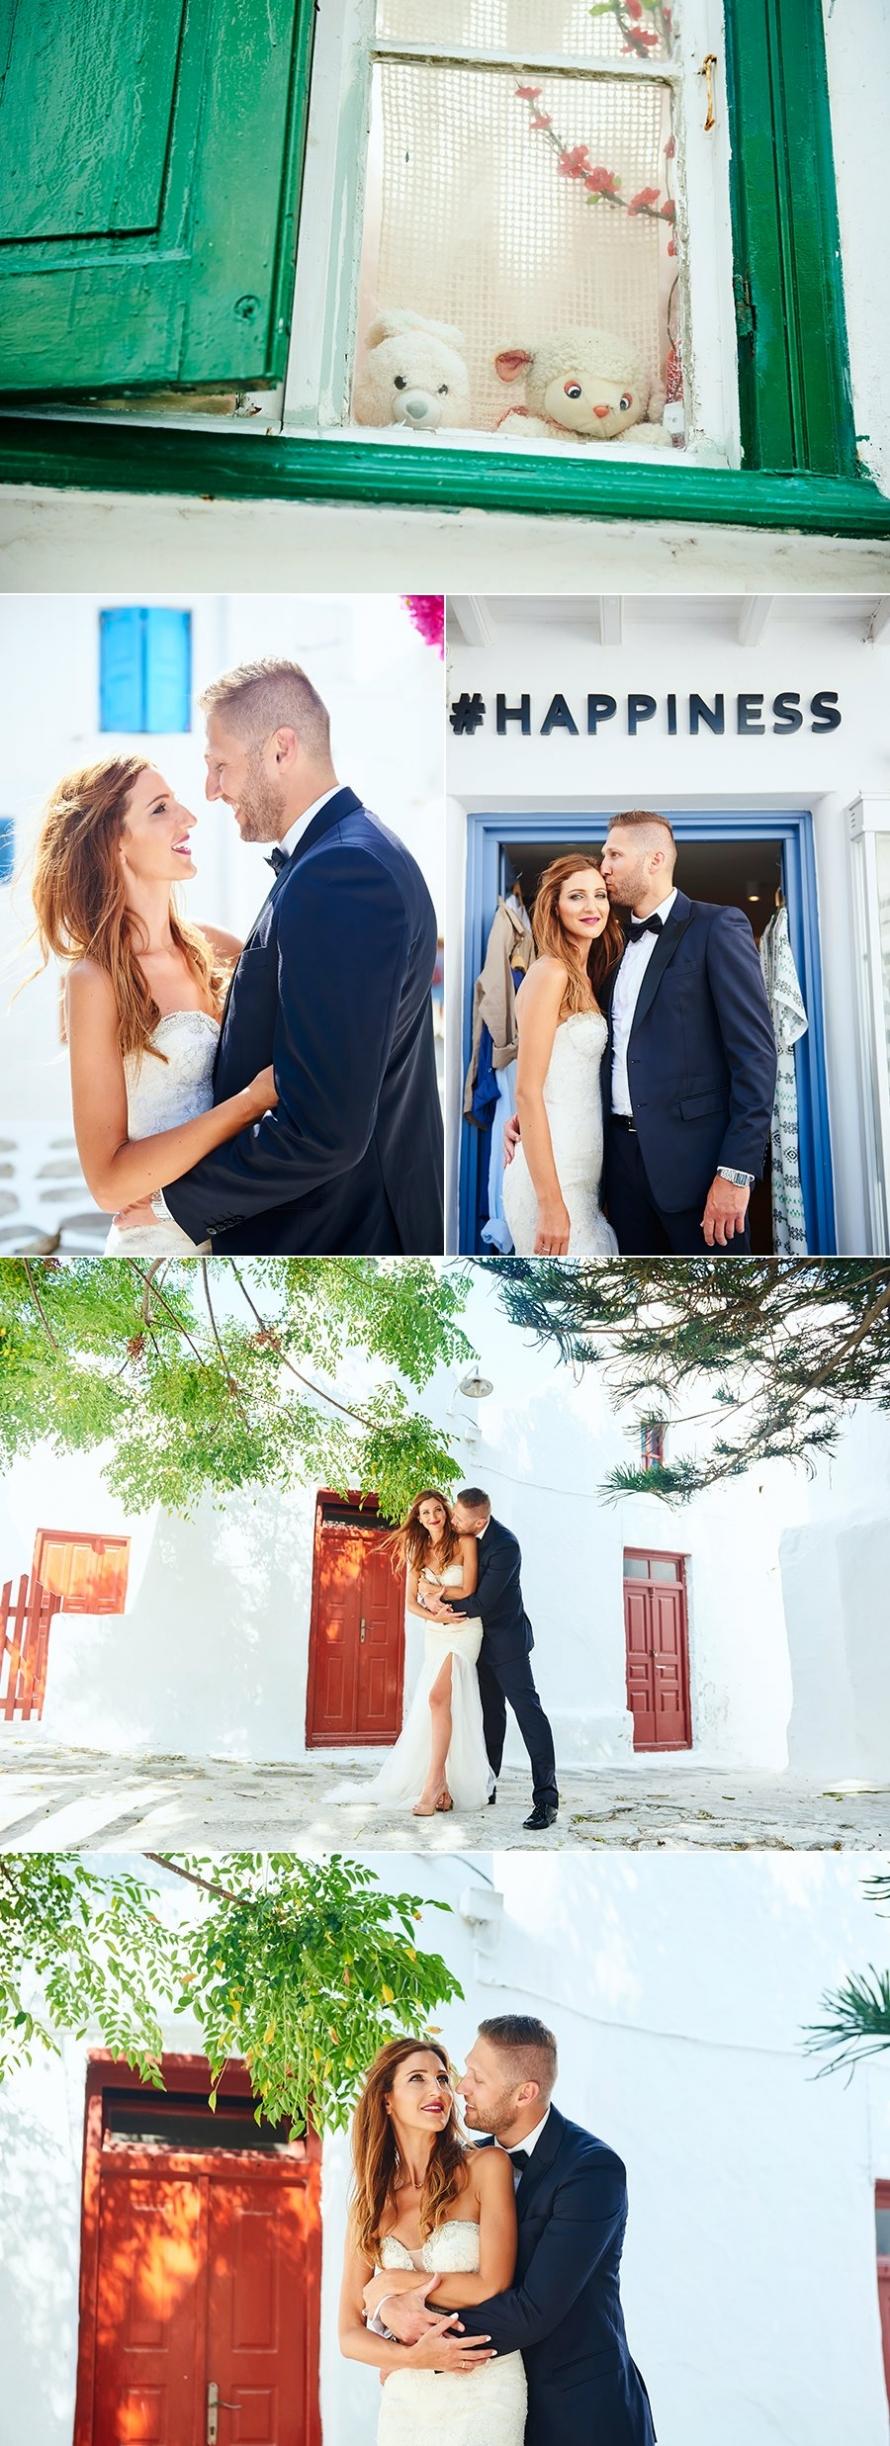 Gragan Gloria wedding photo 04